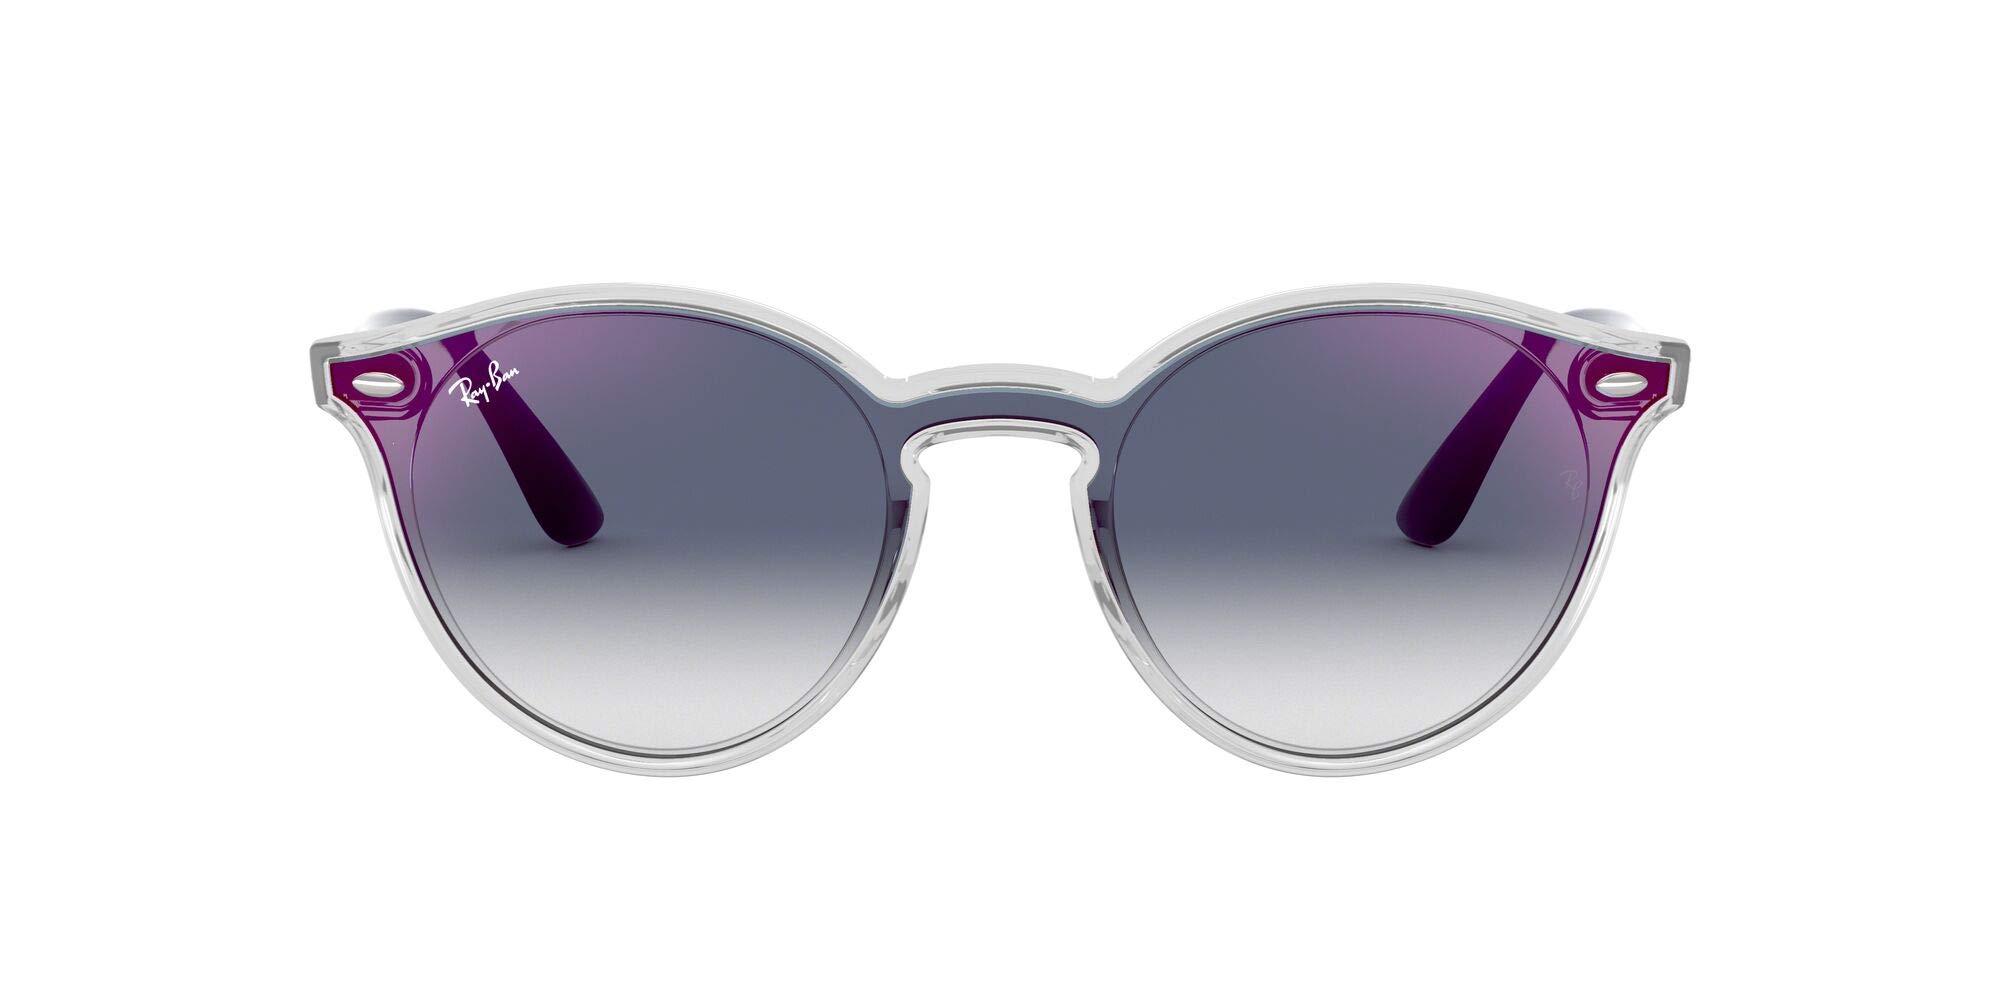 Ray-Ban Rb4380n Blaze Round Sunglasses